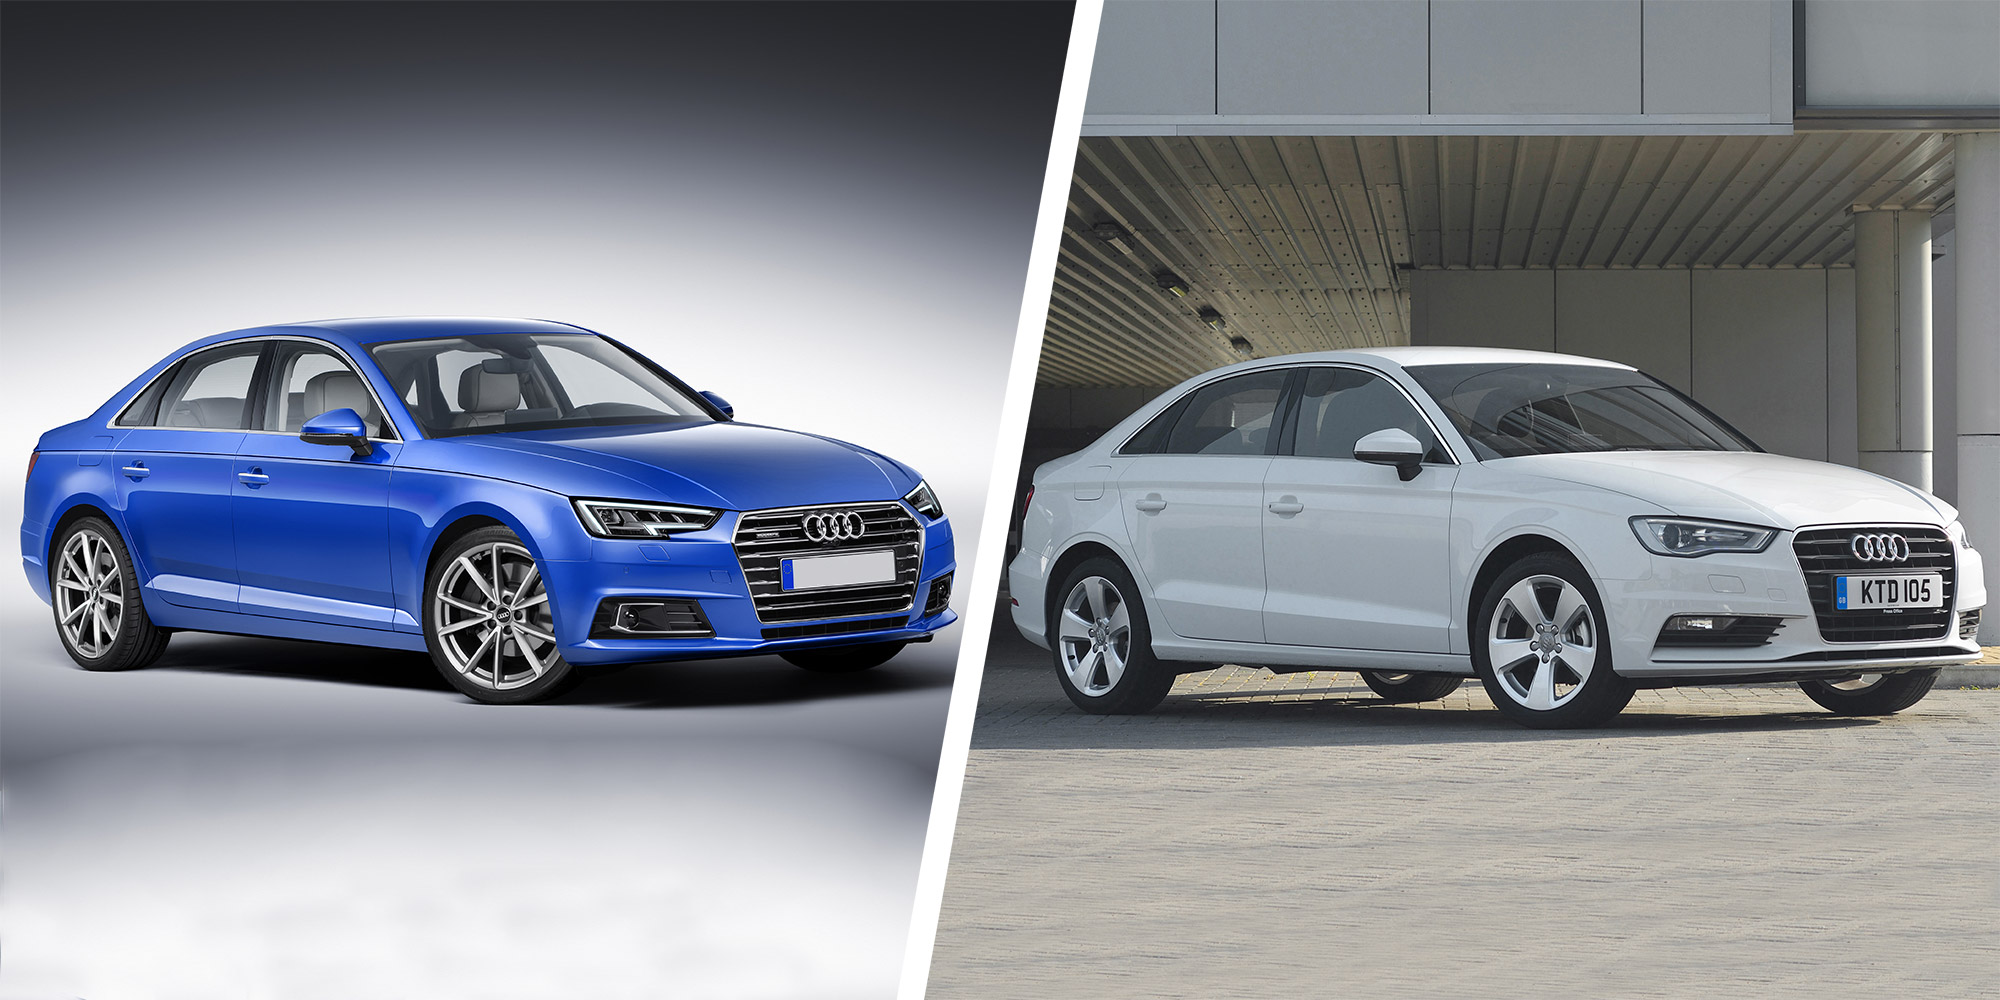 Audi A4 Vs A3 Saloon Sibling Showdown Carwow